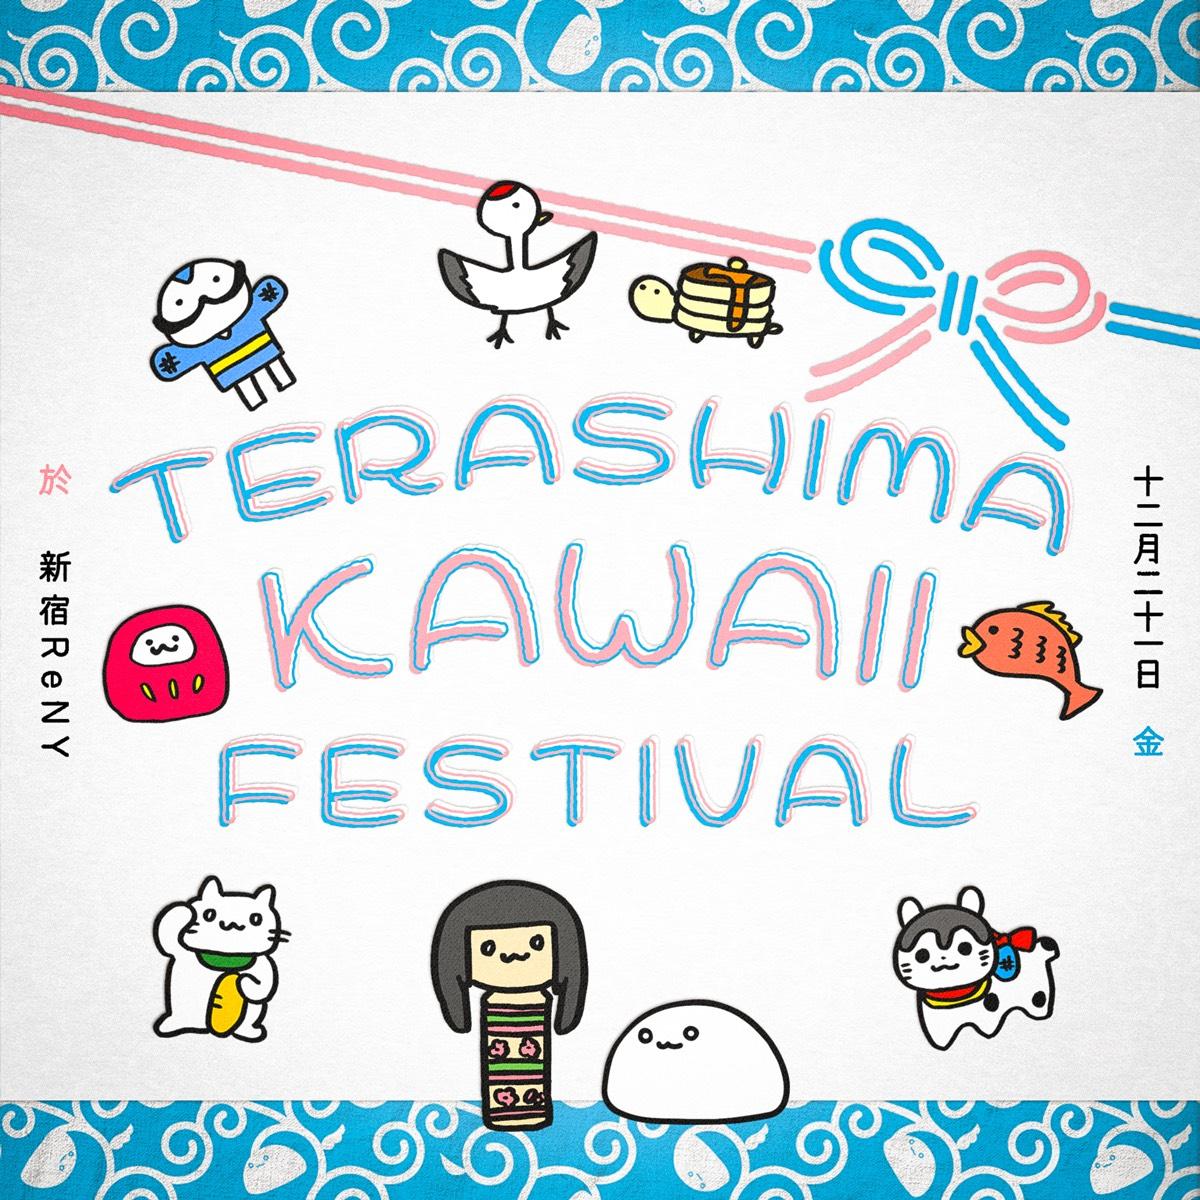 『TERASHIMA KAWAII FESTIVAL』ゆっふぃー編集長直属かわいい特派員